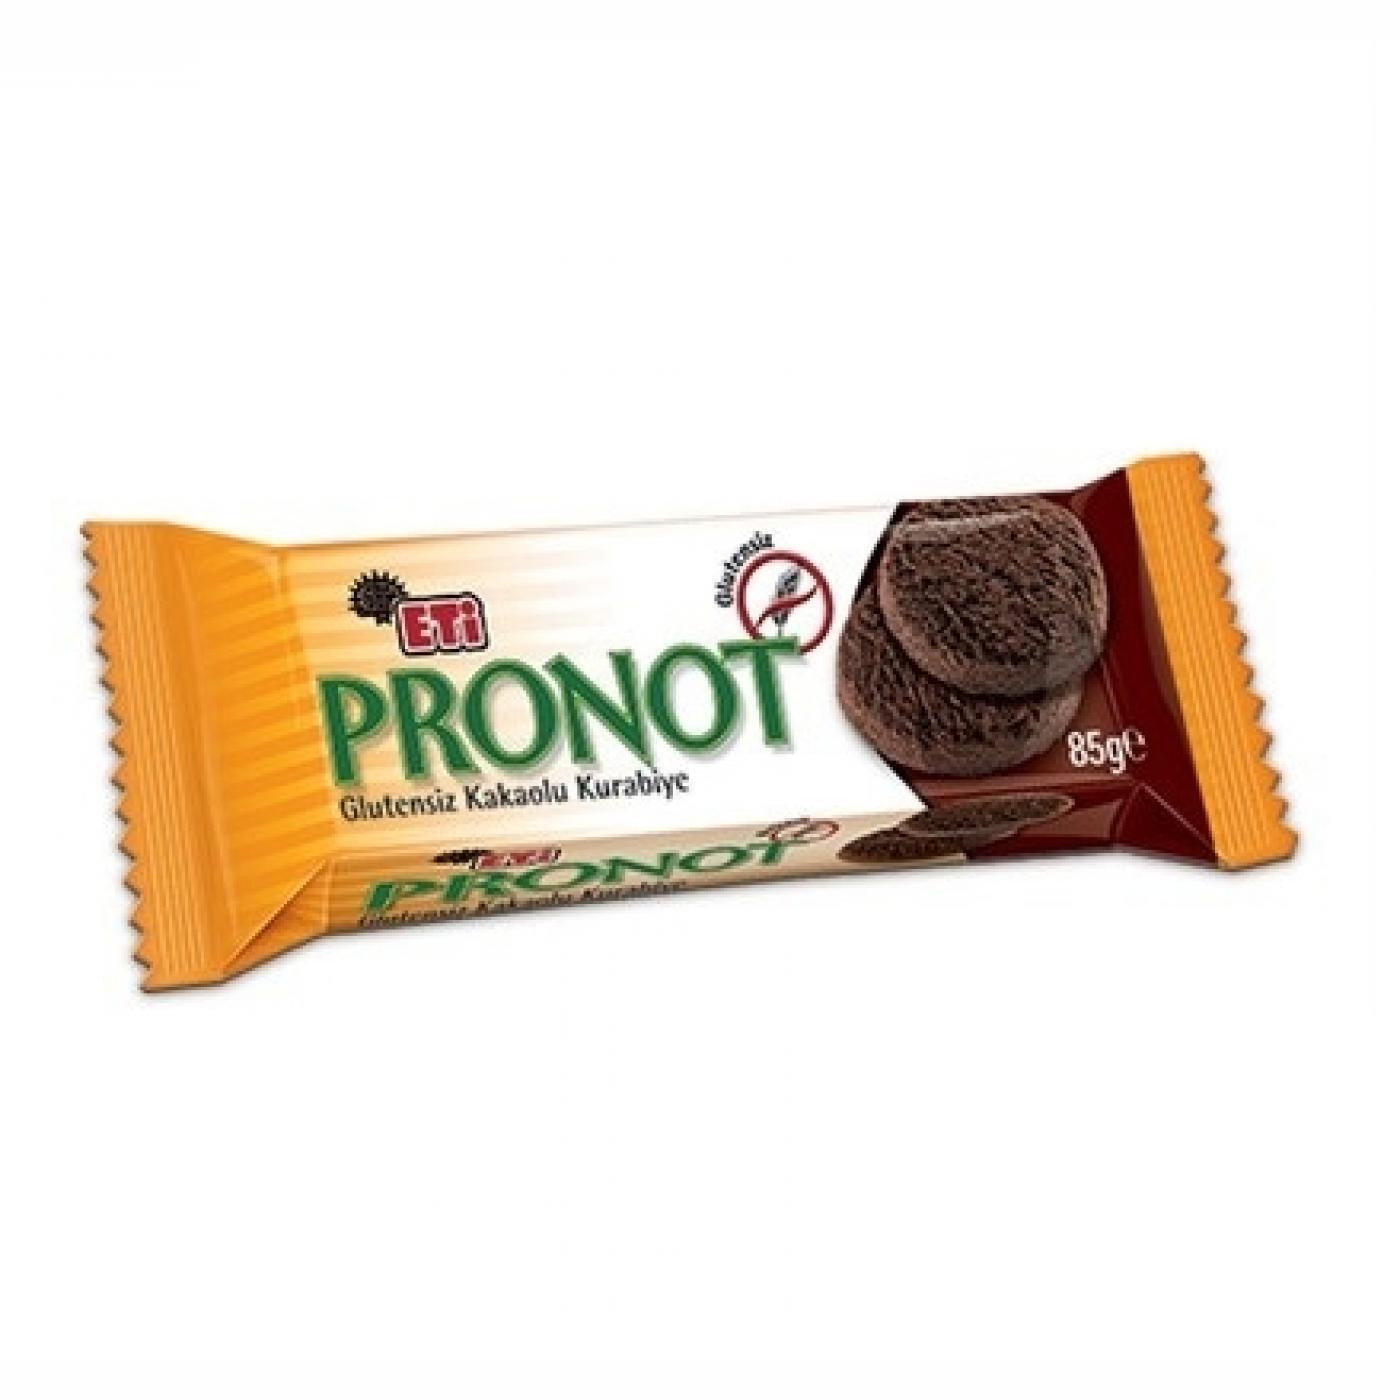 ETİ PRONOT KAKAOLU 85GR